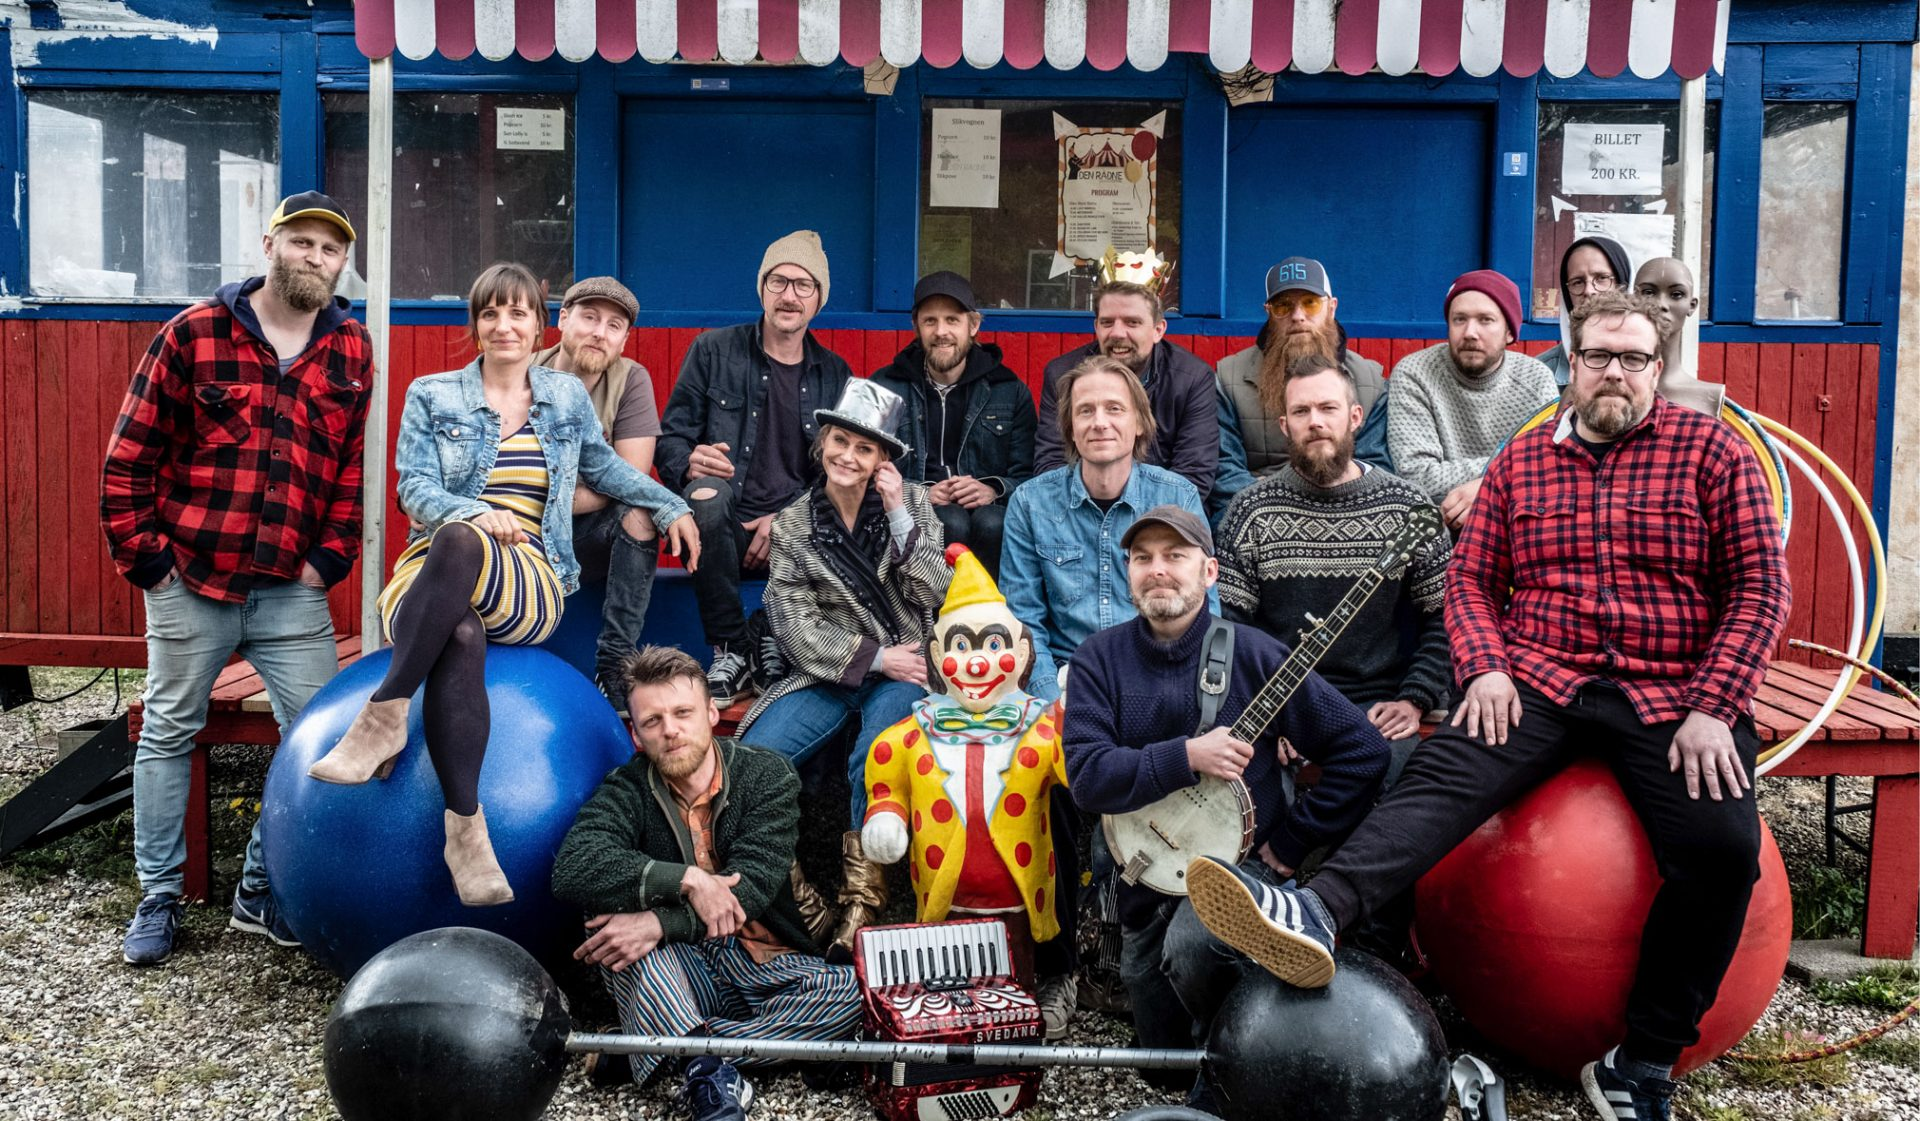 Musikkollektivet Keminova Cowboys udgiver deres 2. album Cirkus Danmark